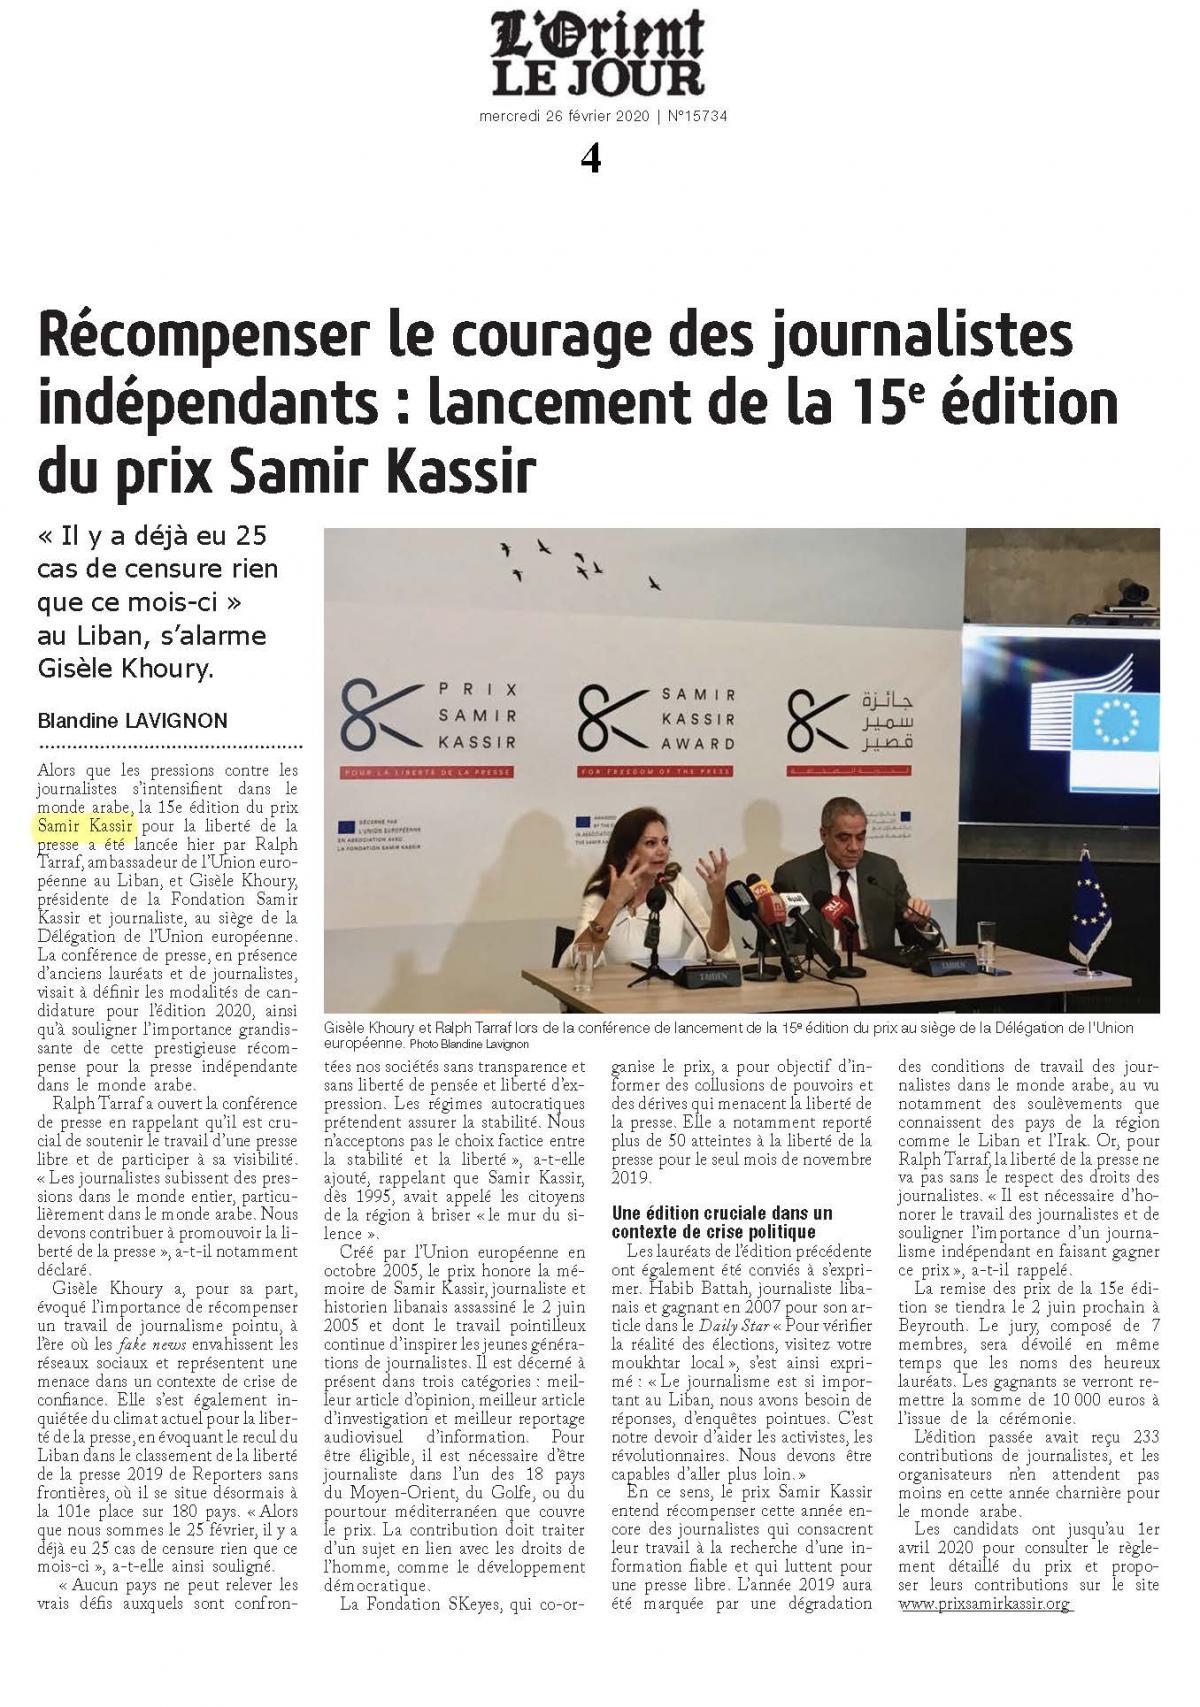 Samir Kassir Award in L'Orient-Le Jour - 26 February 2020